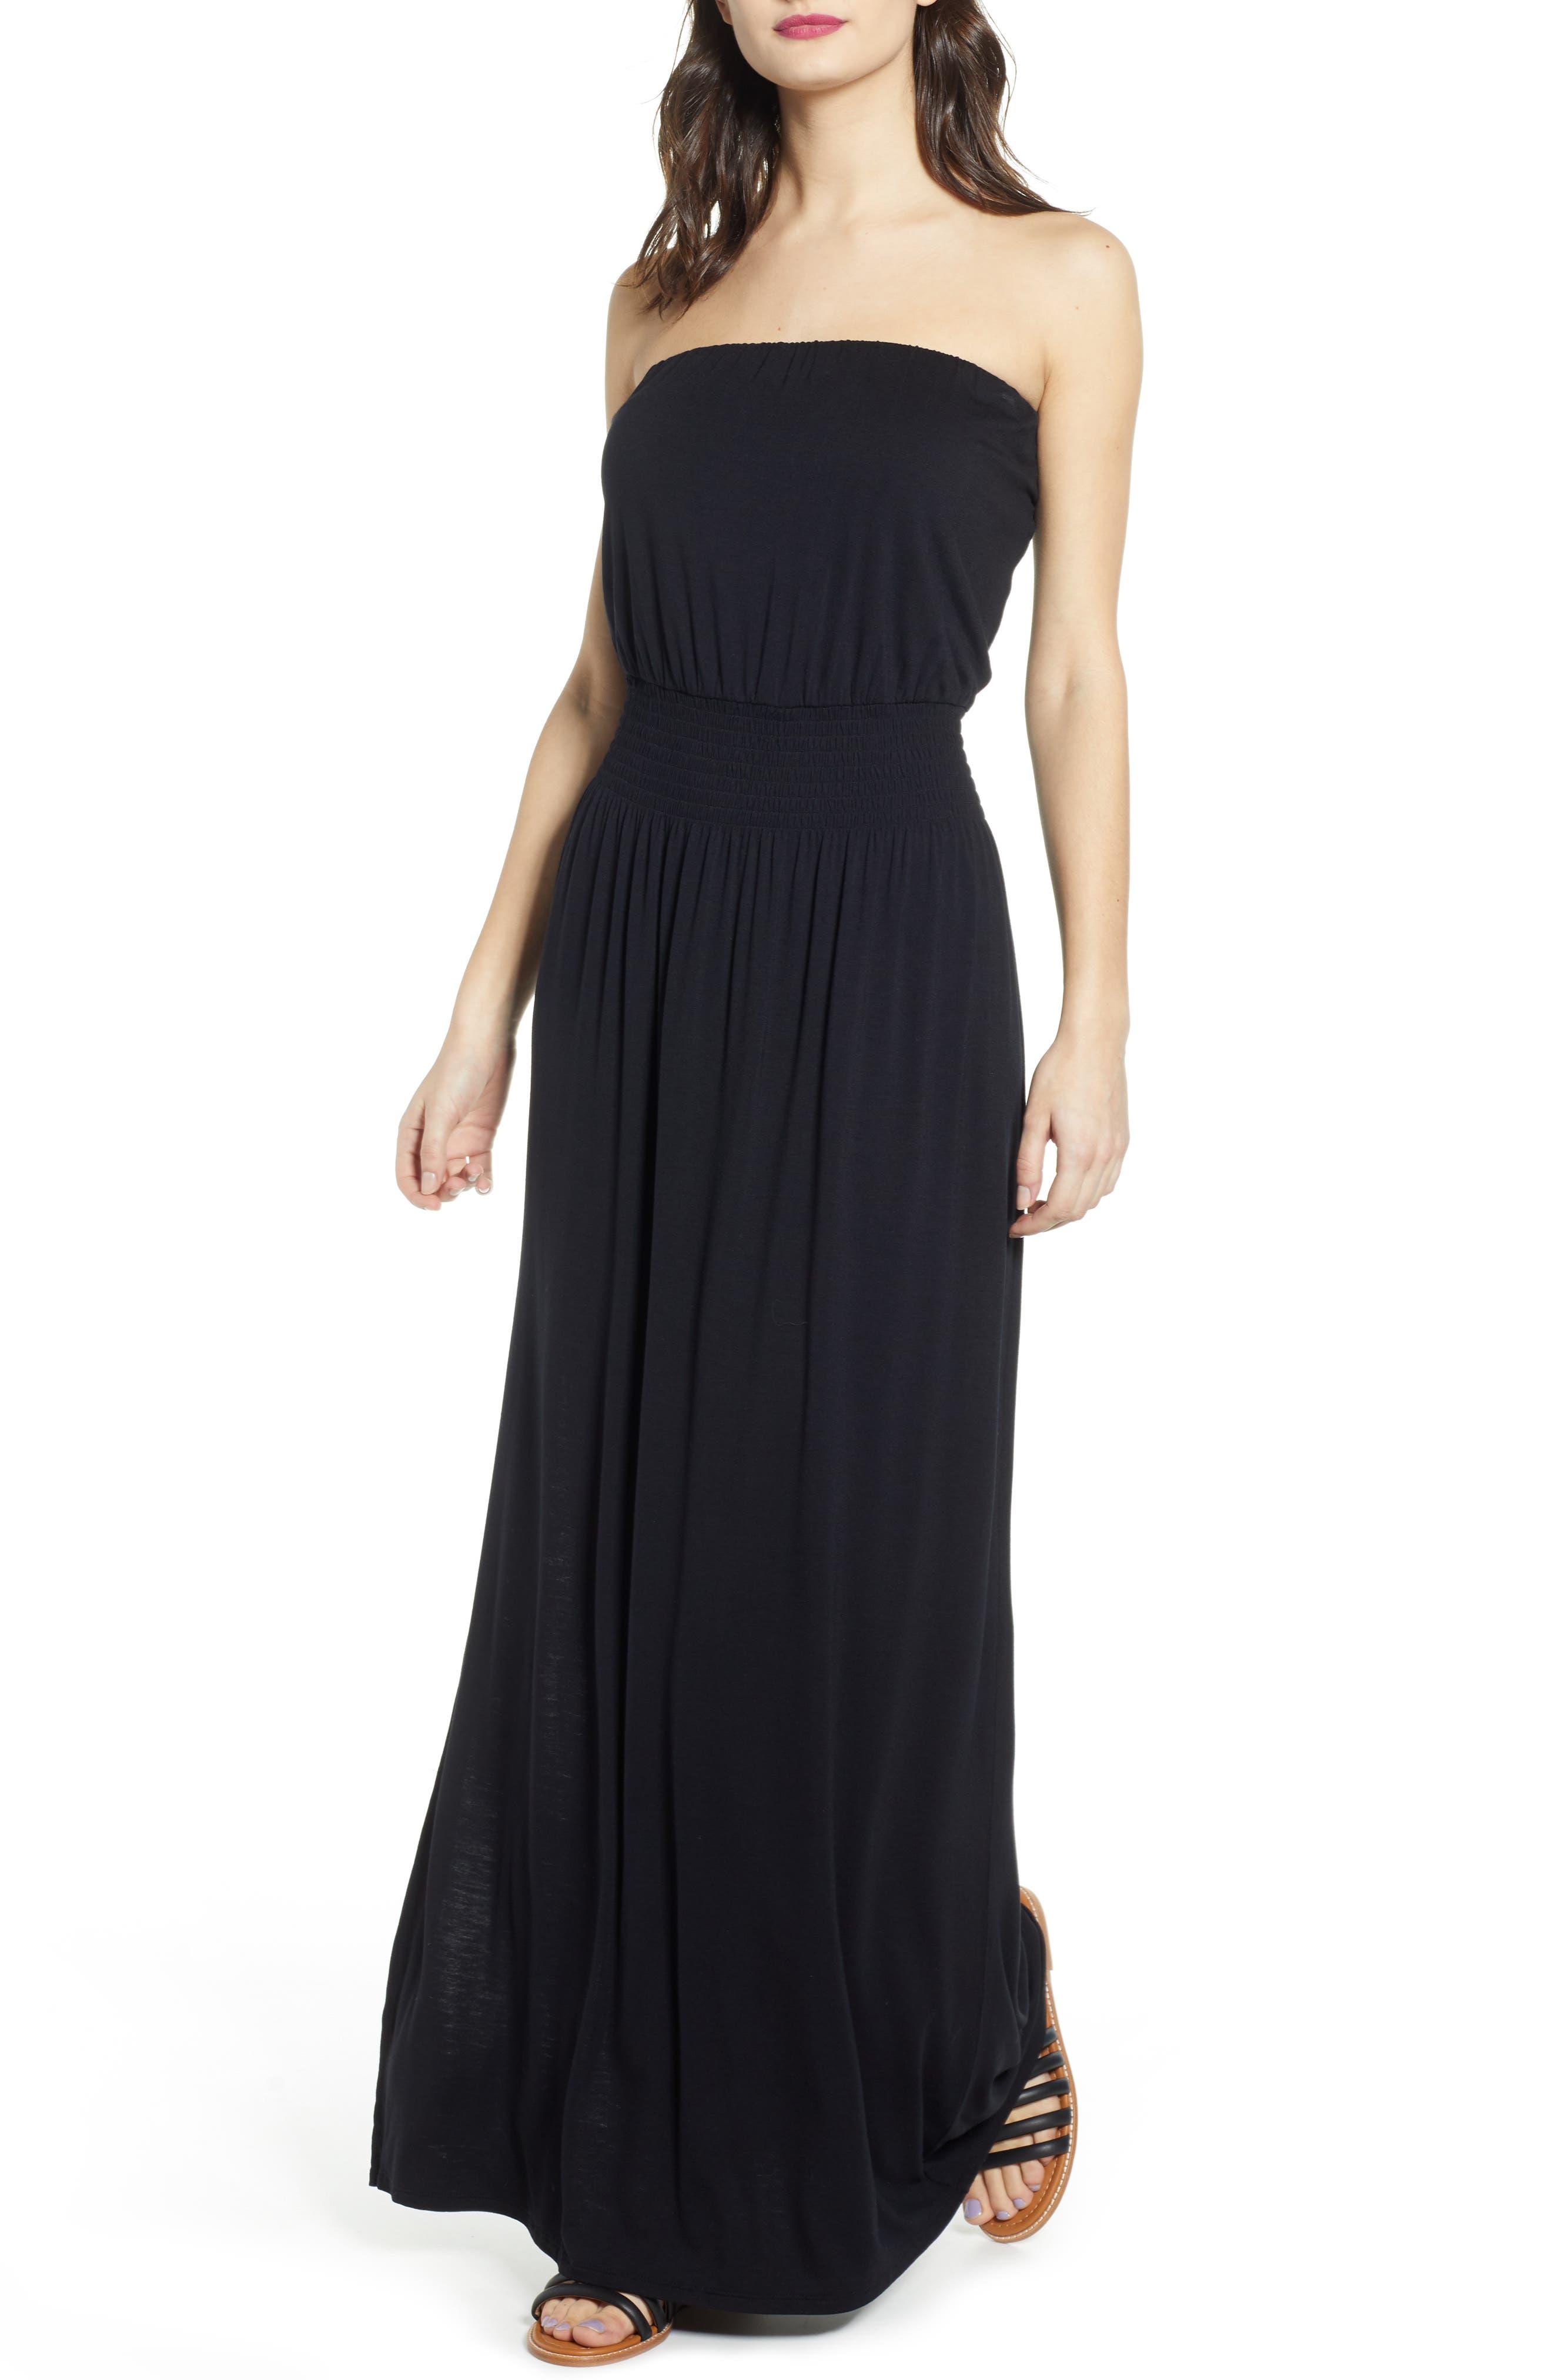 Bp. Strapless Maxi Dress